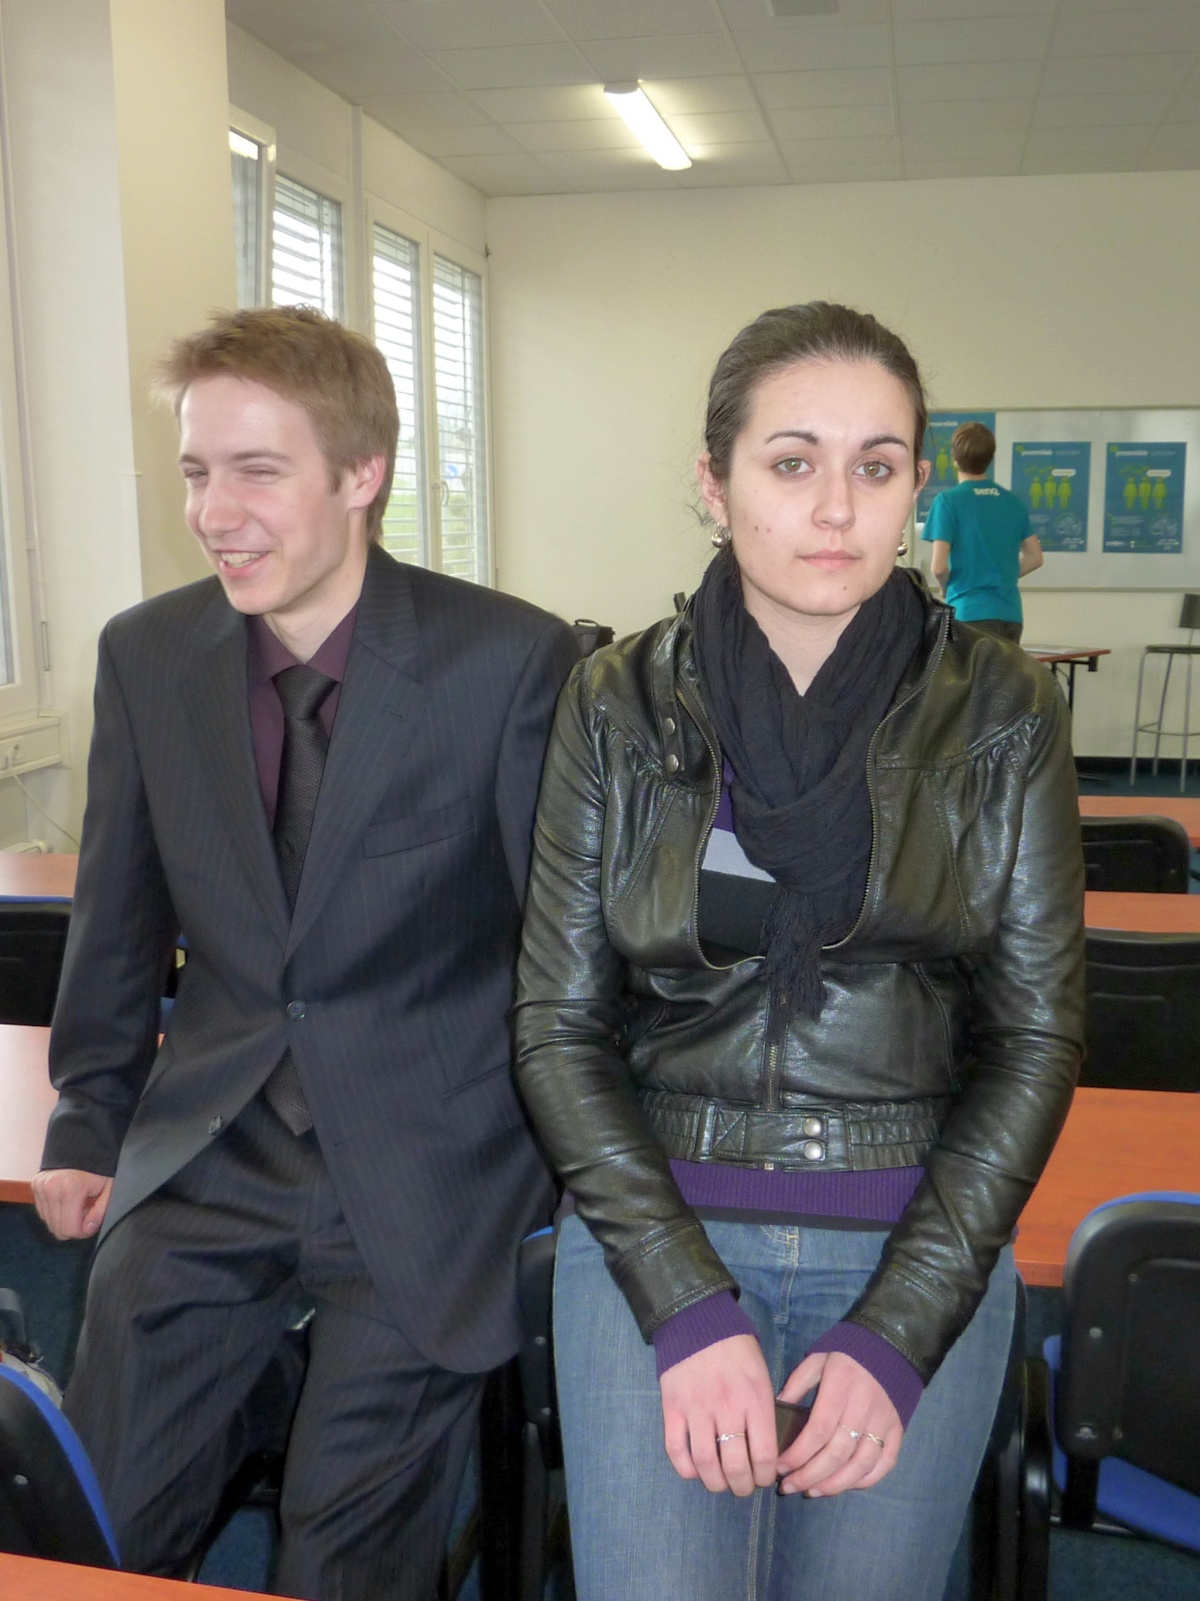 Prezentiada 2011: moderátoři finále Dan Pražák a Adéla Šrutová